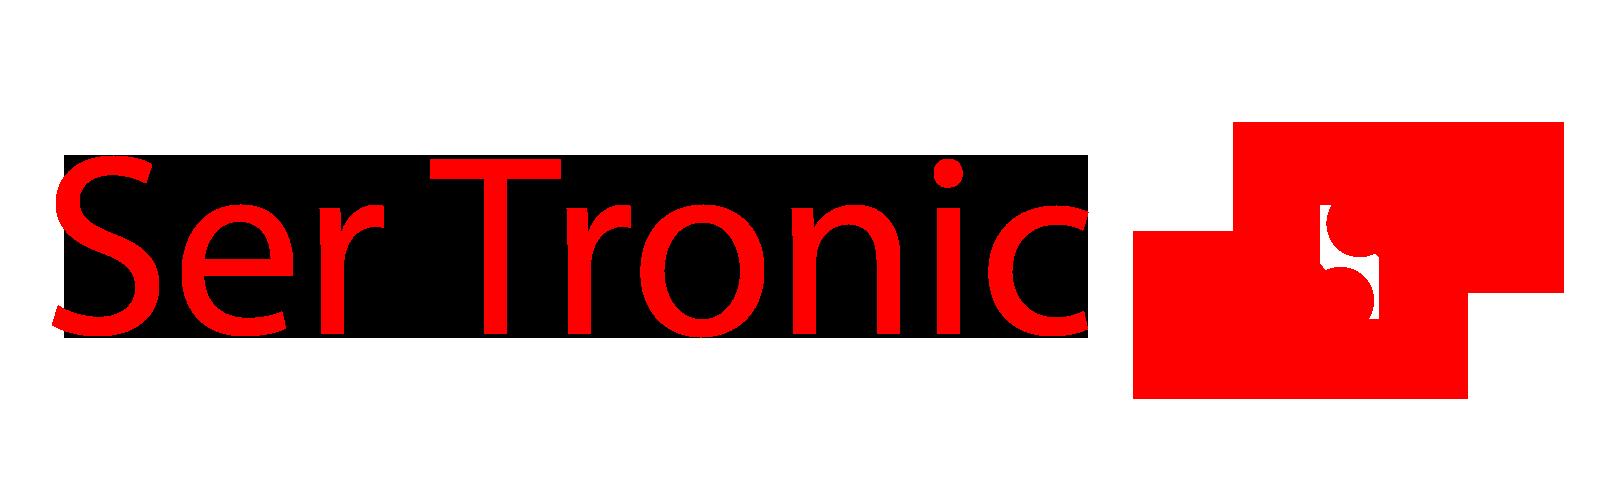 Sertronic-